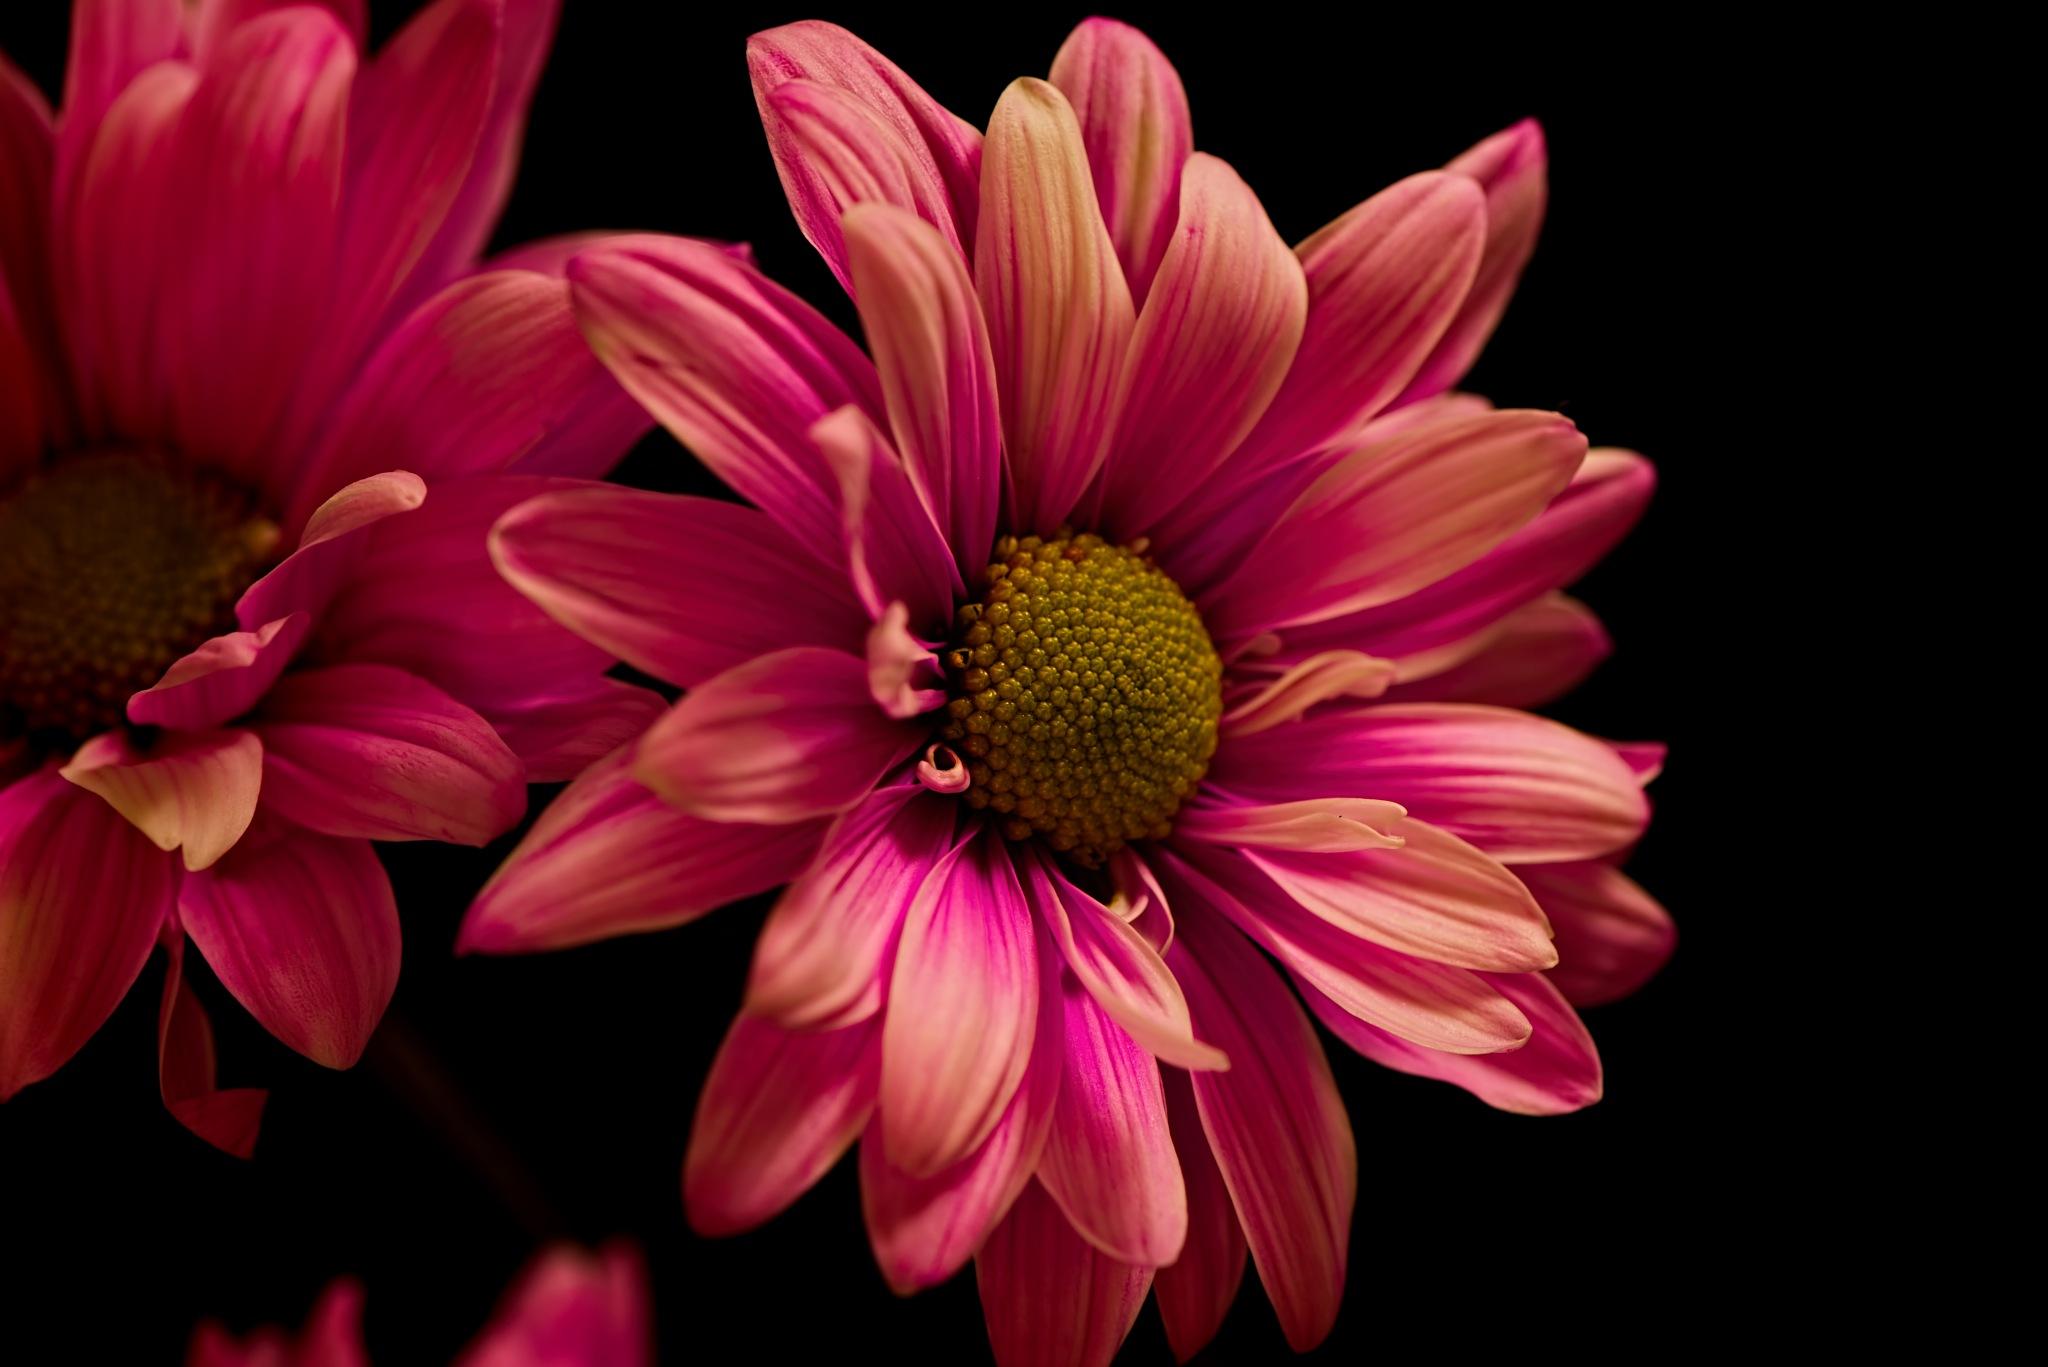 Softly Pink 1110 by ThomasJerger